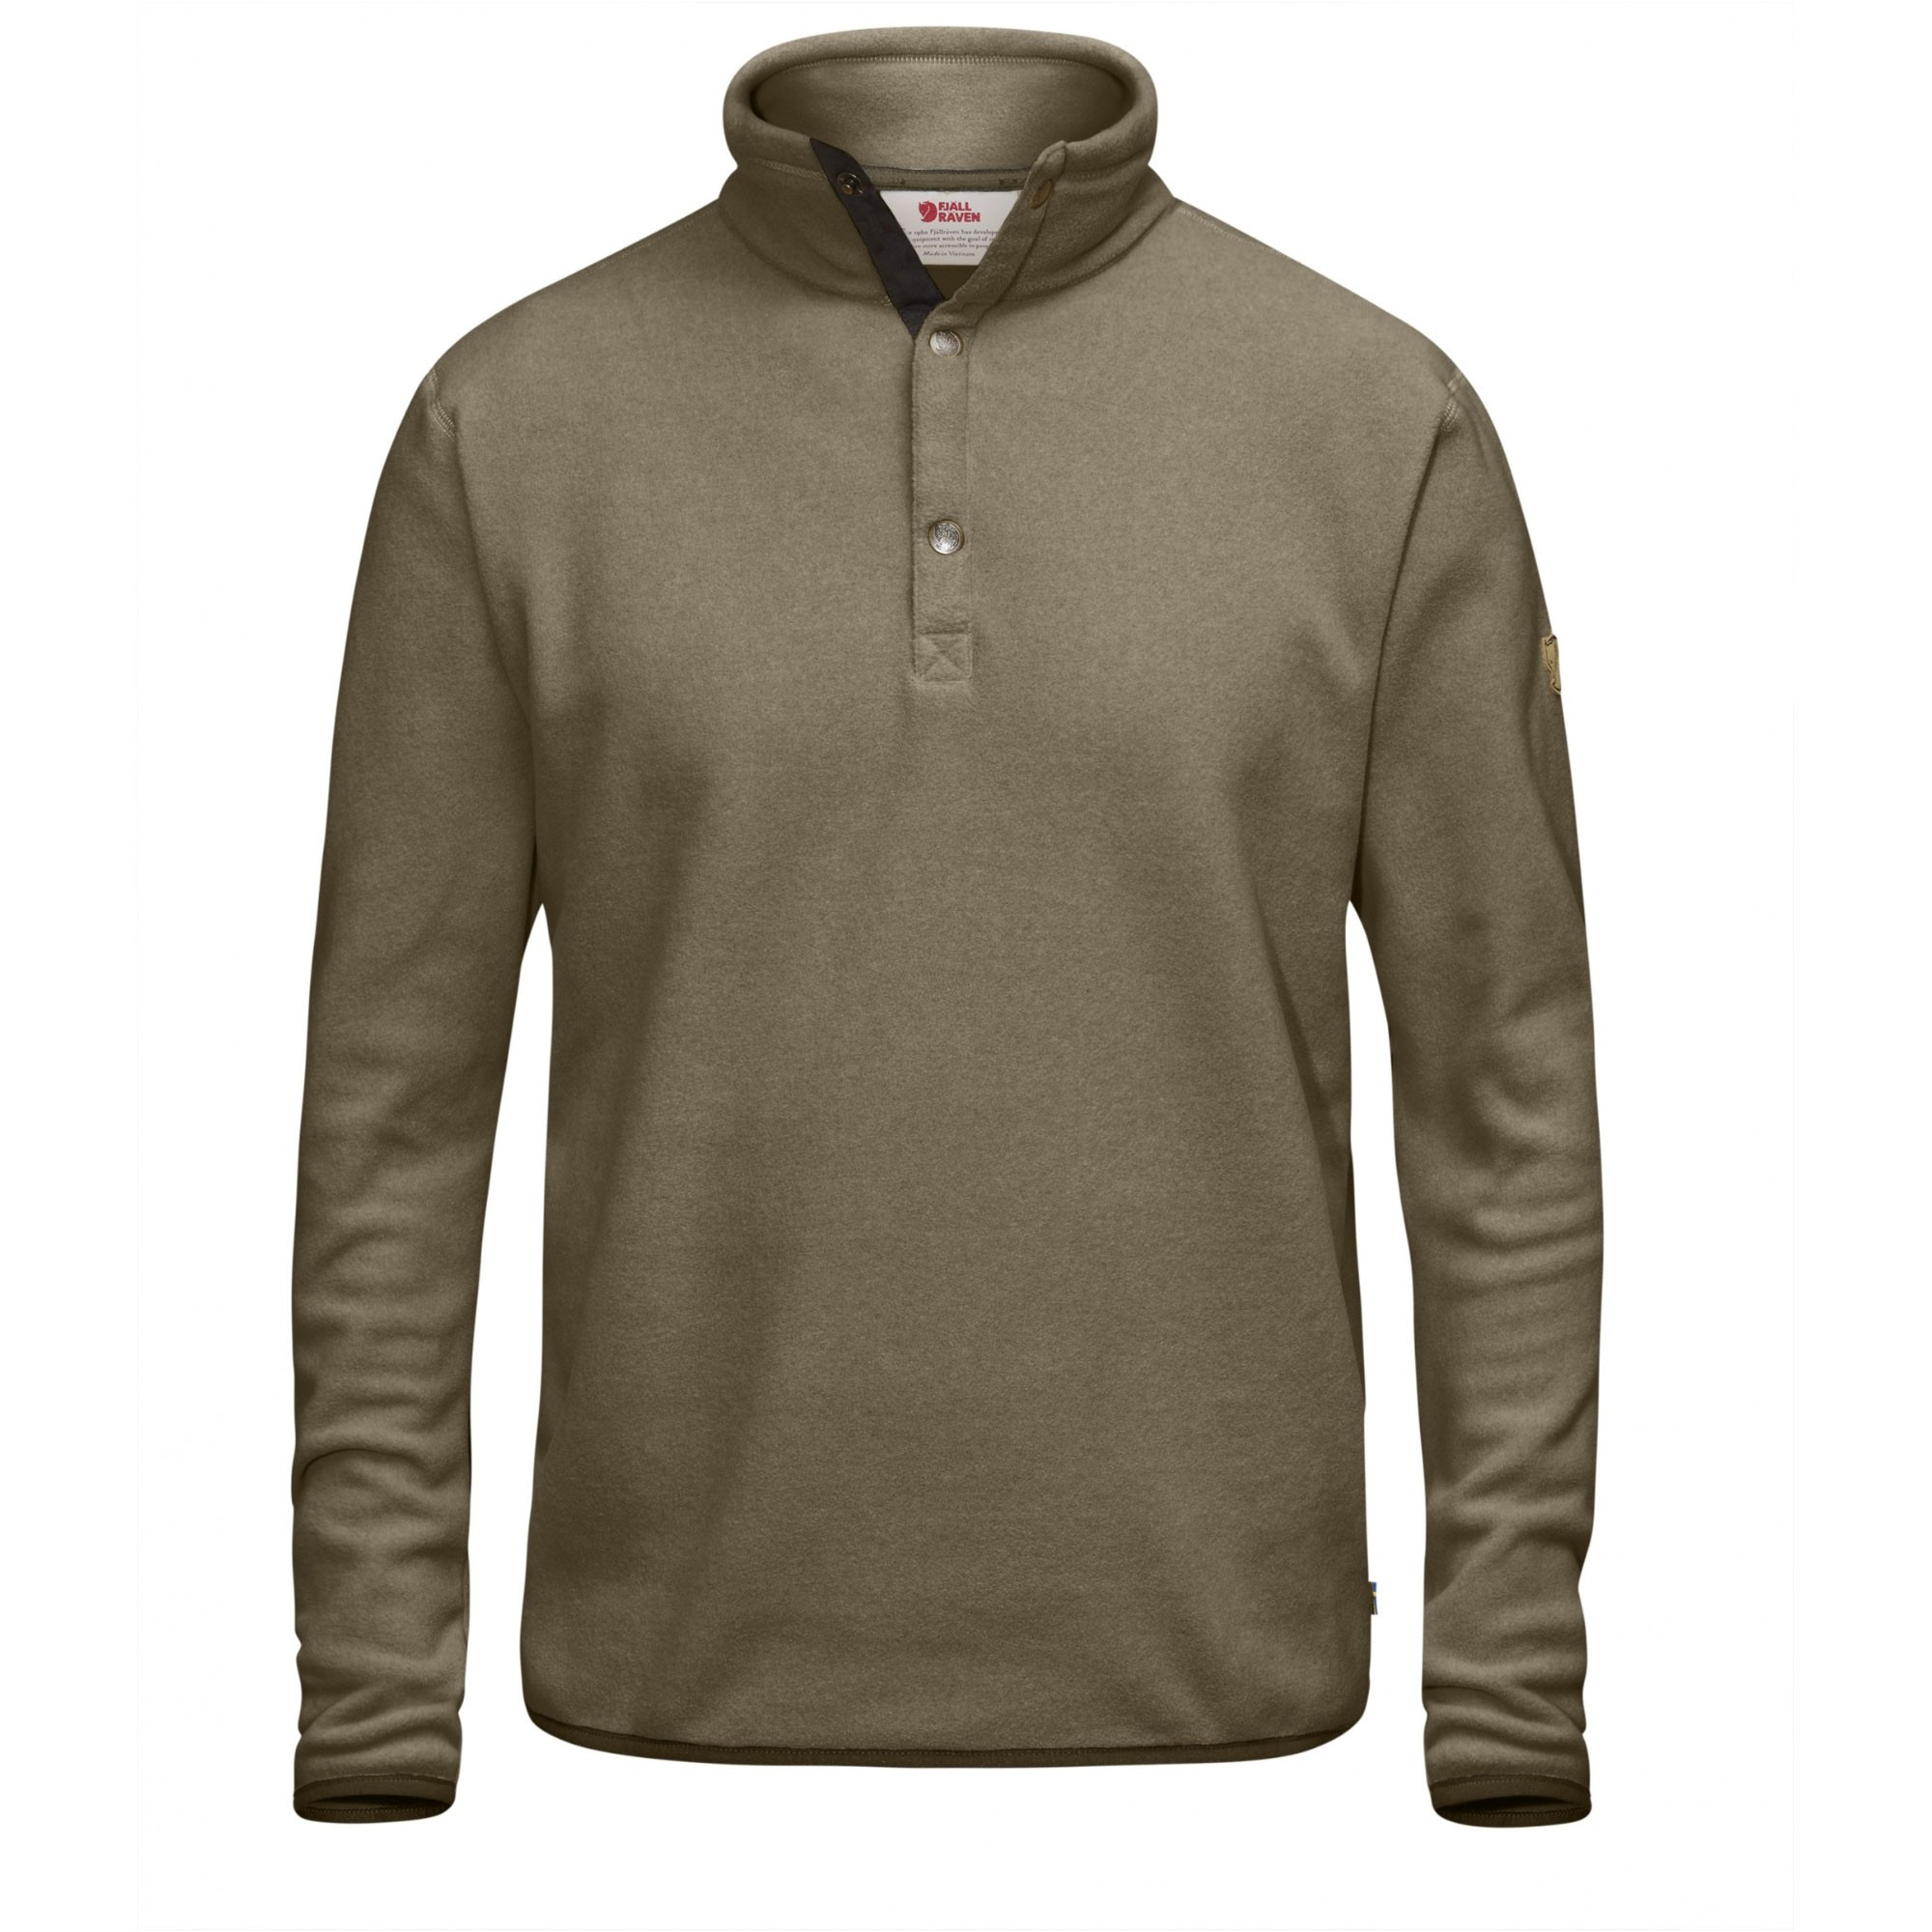 Fjallraven-Ovik-Fleece-Sweater-Taupe-W17.jpg